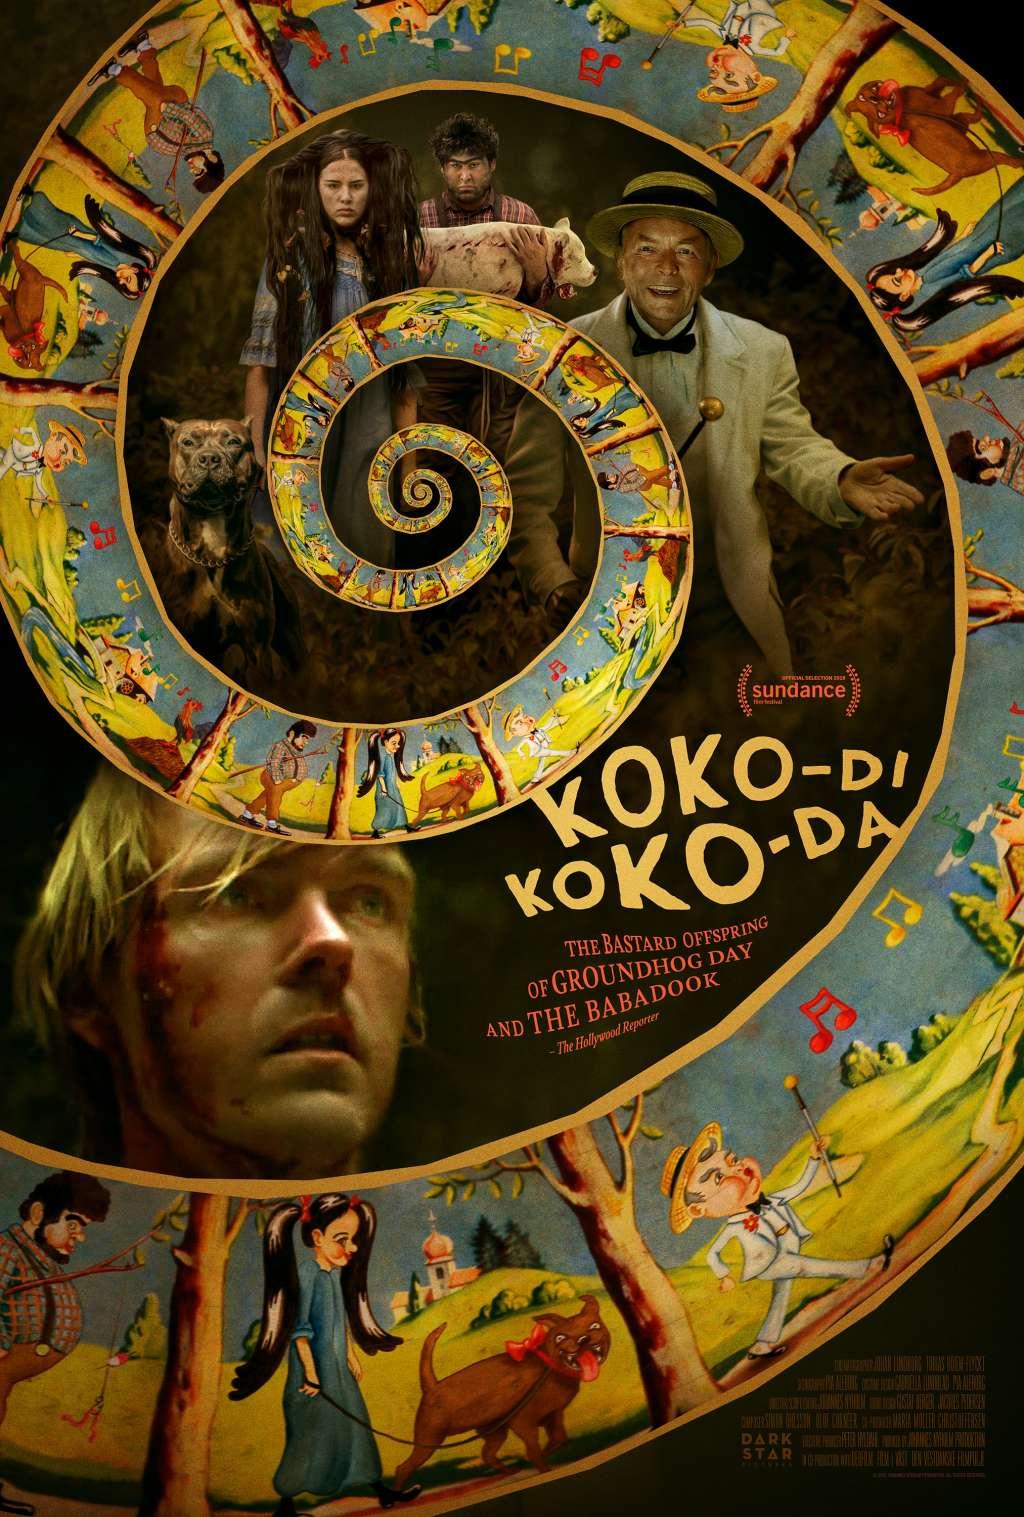 Koko-di Koko-da kapak